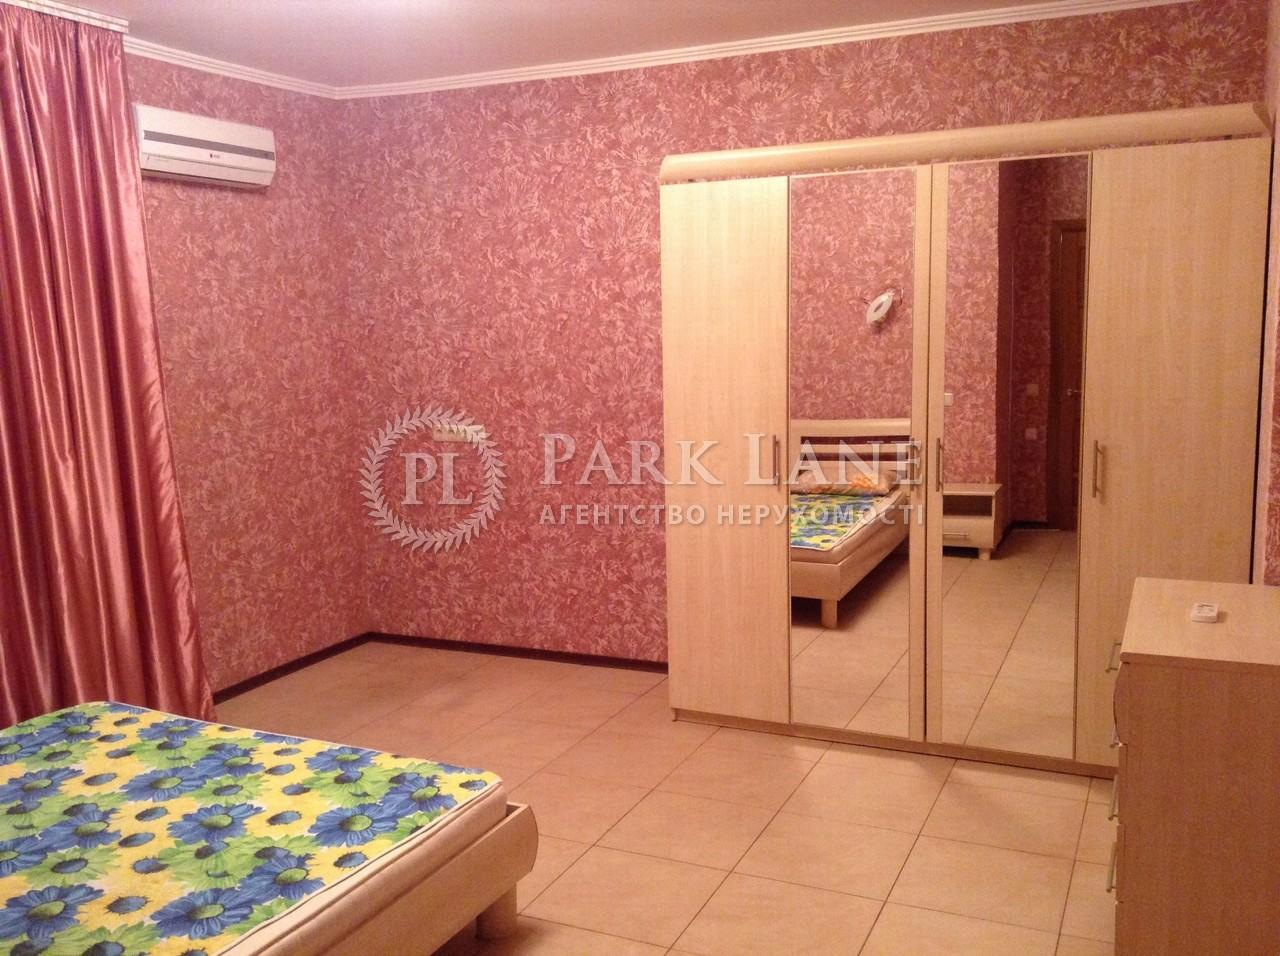 Квартира ул. Чавдар Елизаветы, 3, Киев, R-17190 - Фото 10